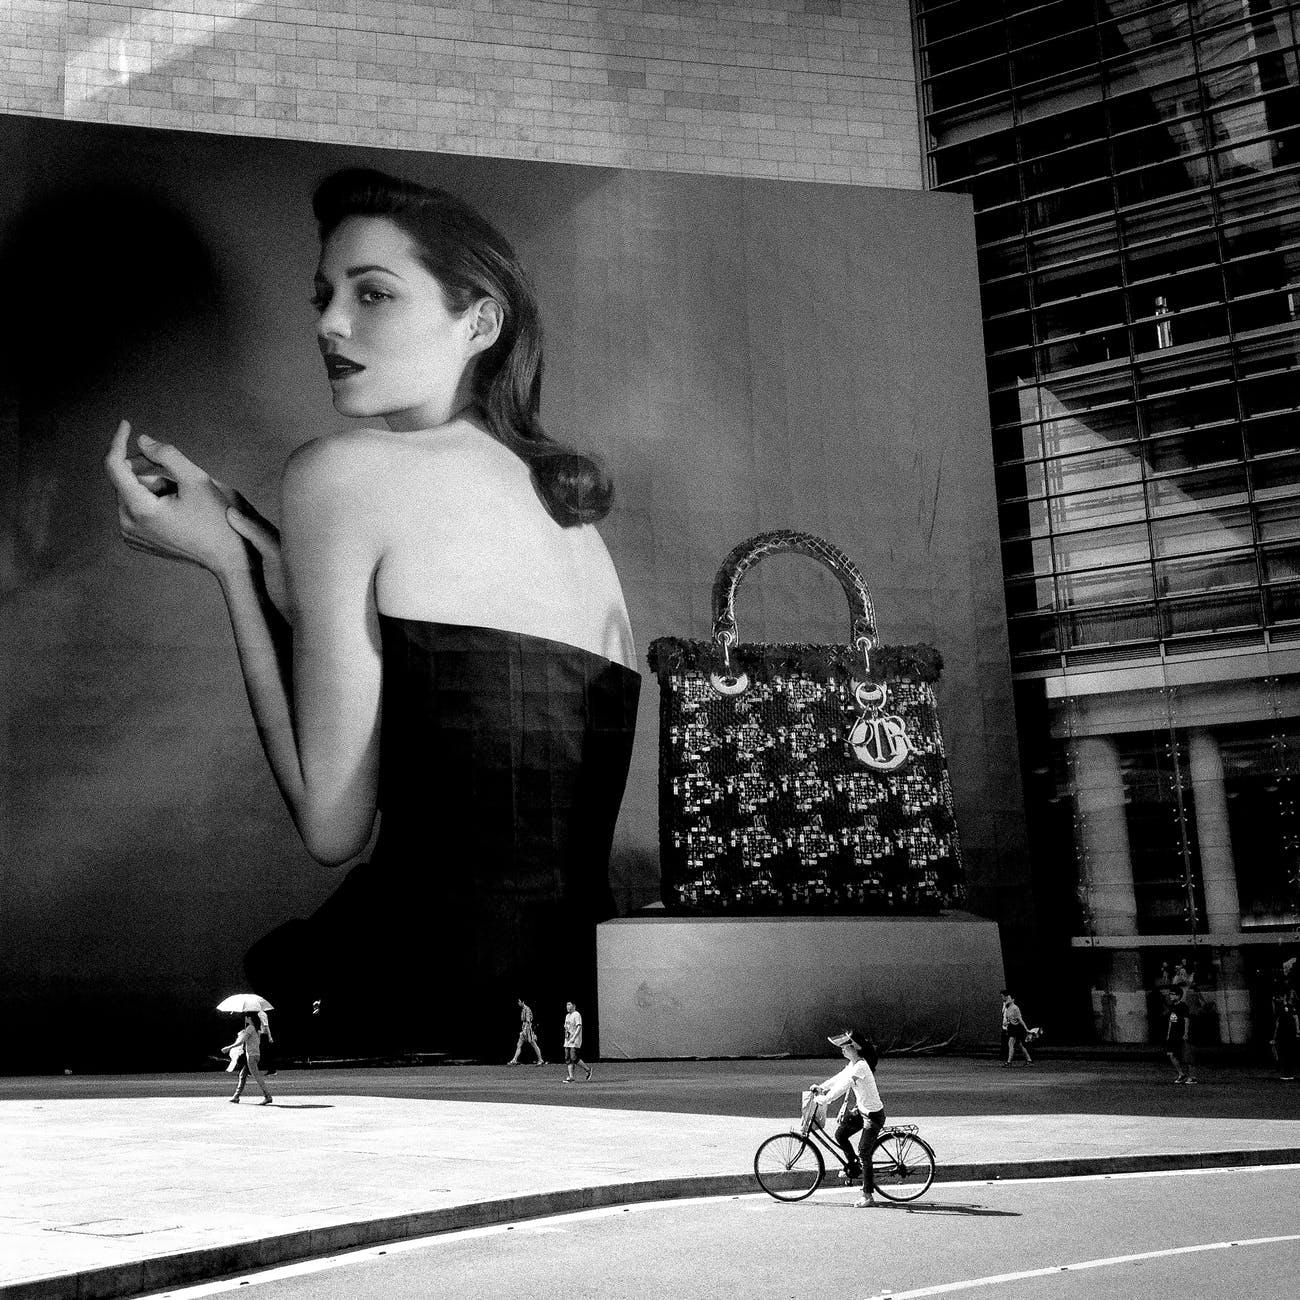 woman wearing black tube dress painting